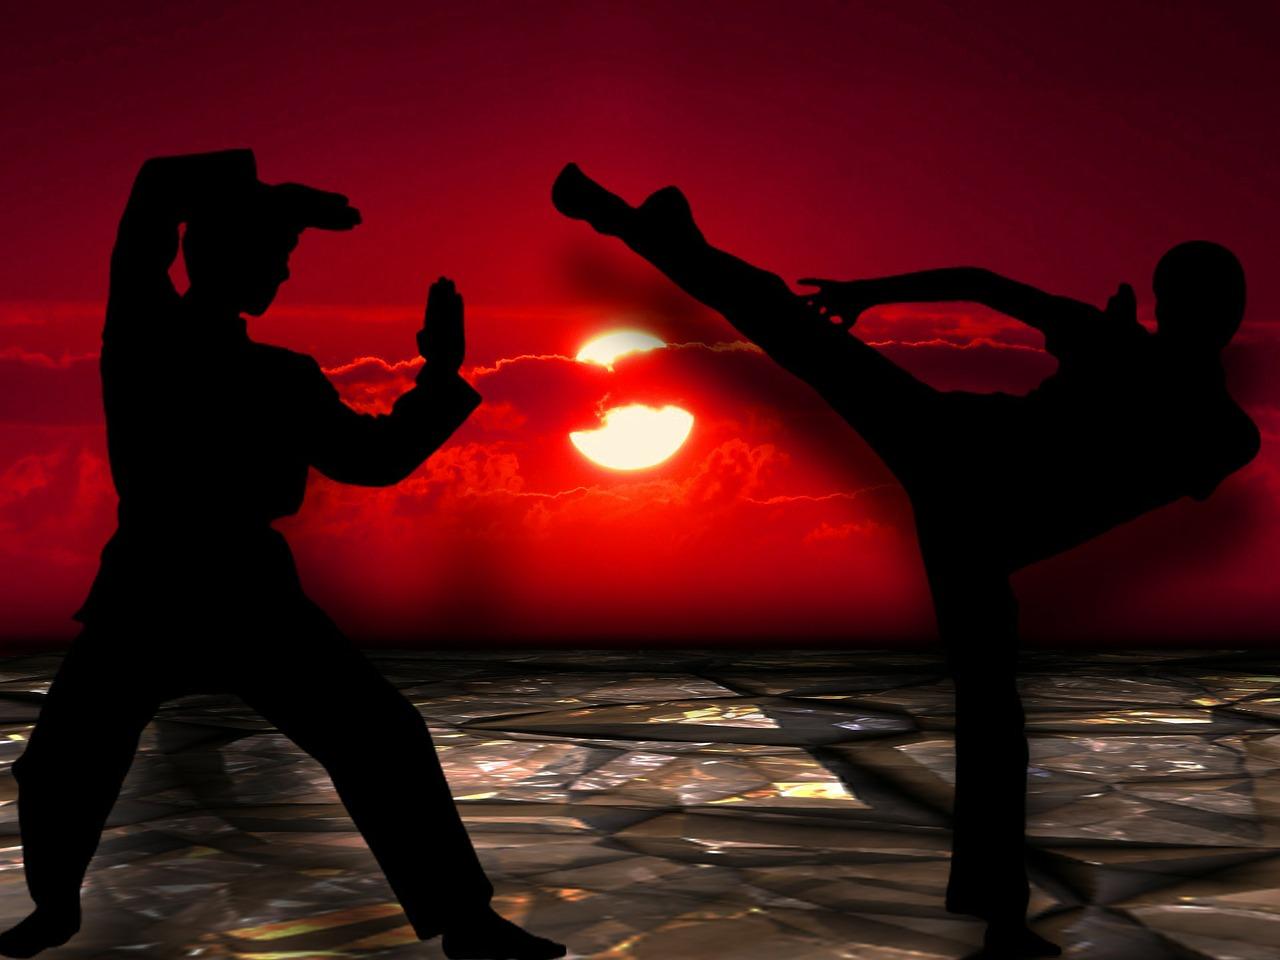 https://pixabay.com/en/martial-arts-silhuetten-muay-thai-291049/